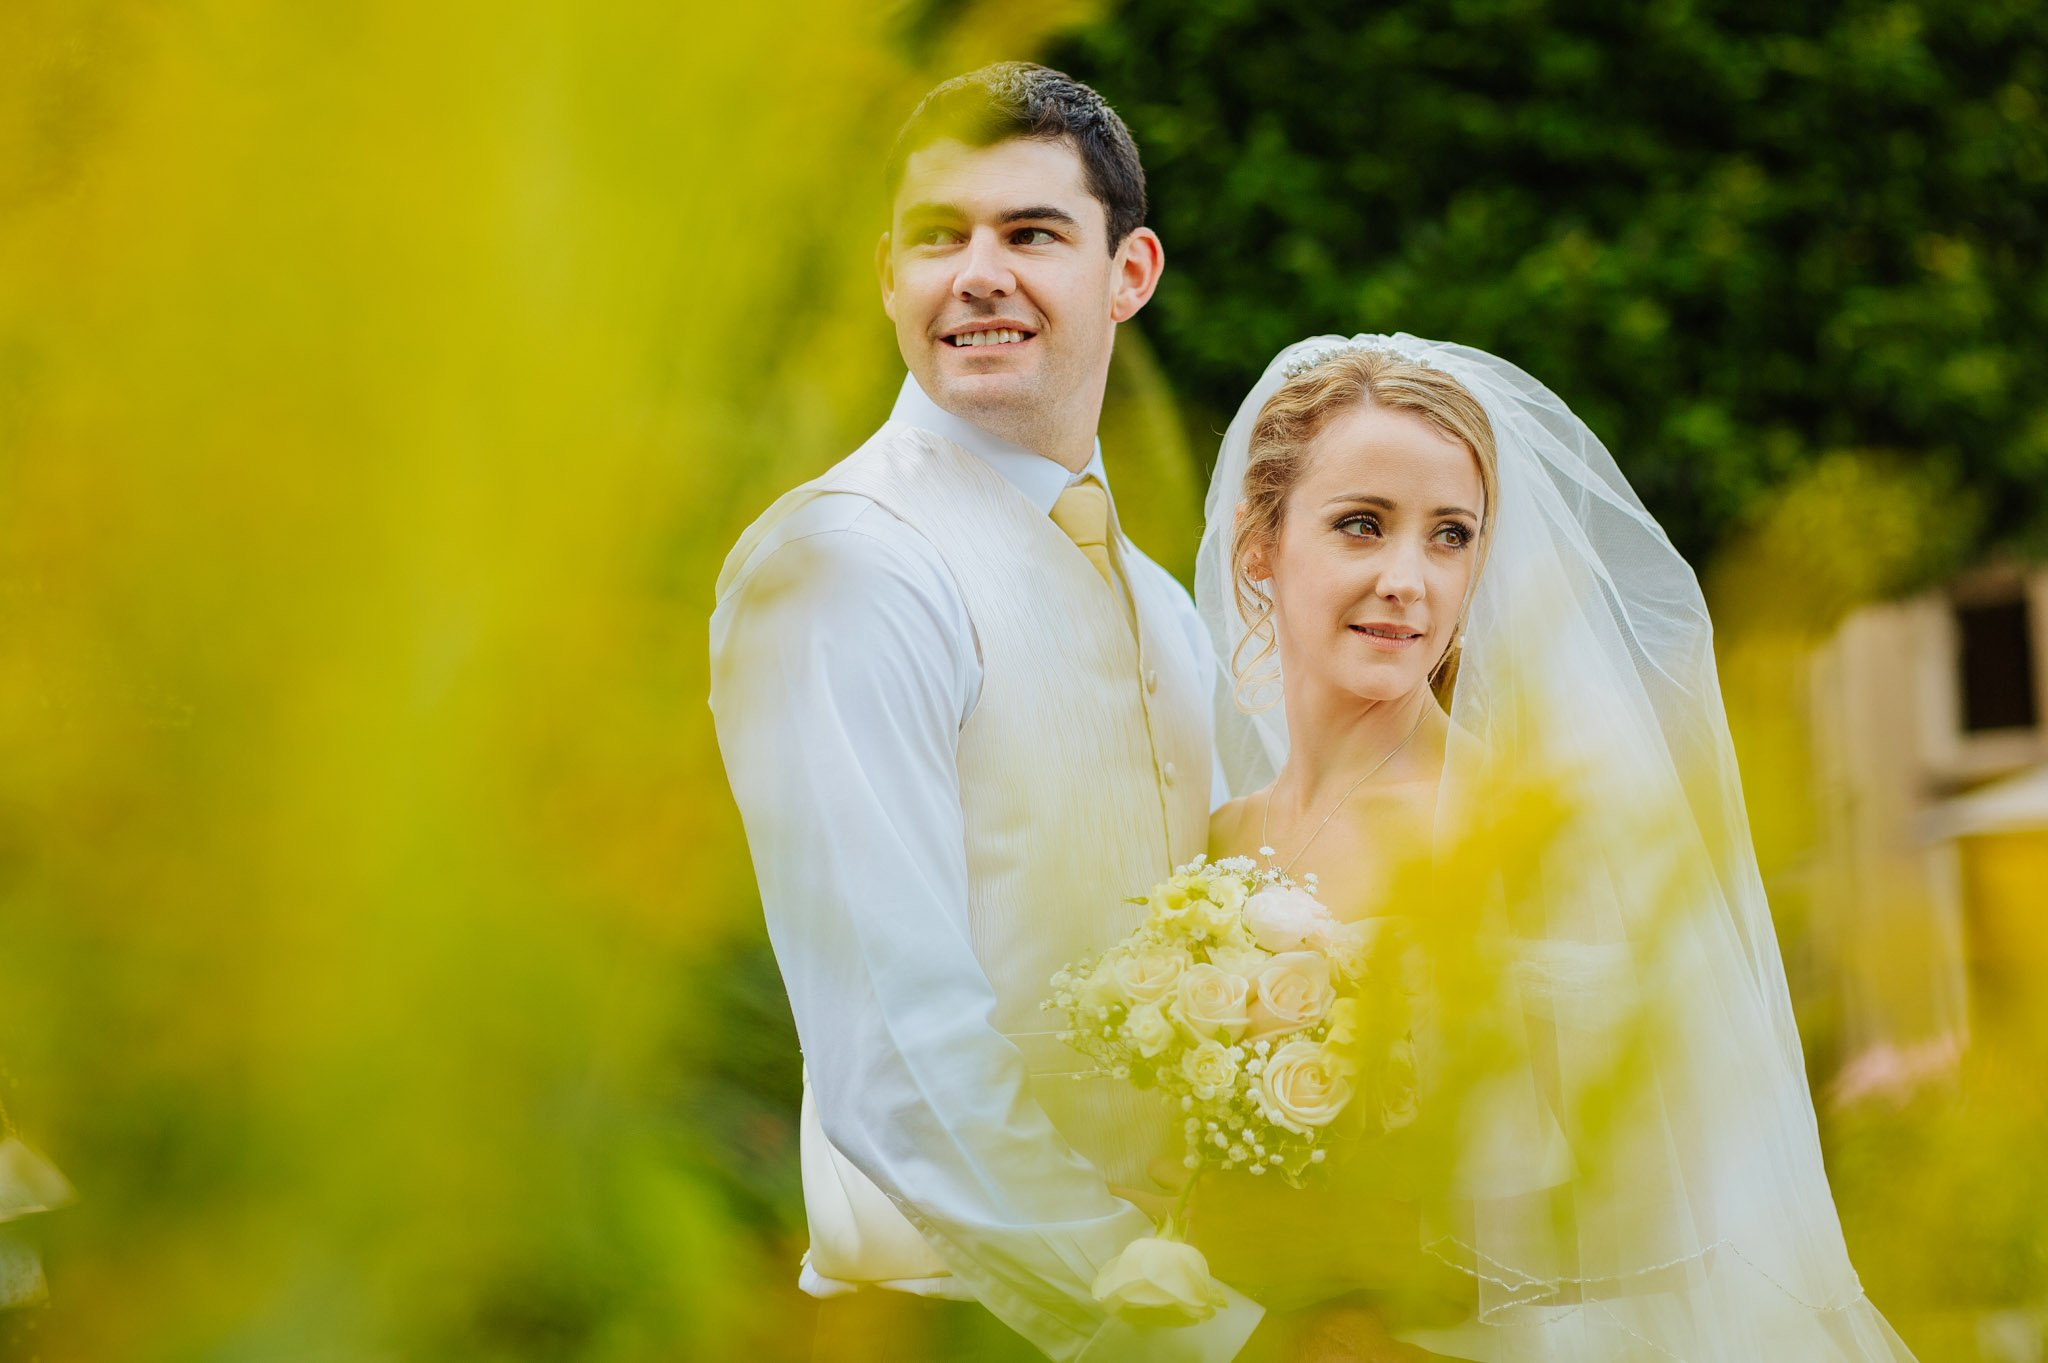 Georgina + Mike - Wedding photography in Malvern, Worcestershire 73